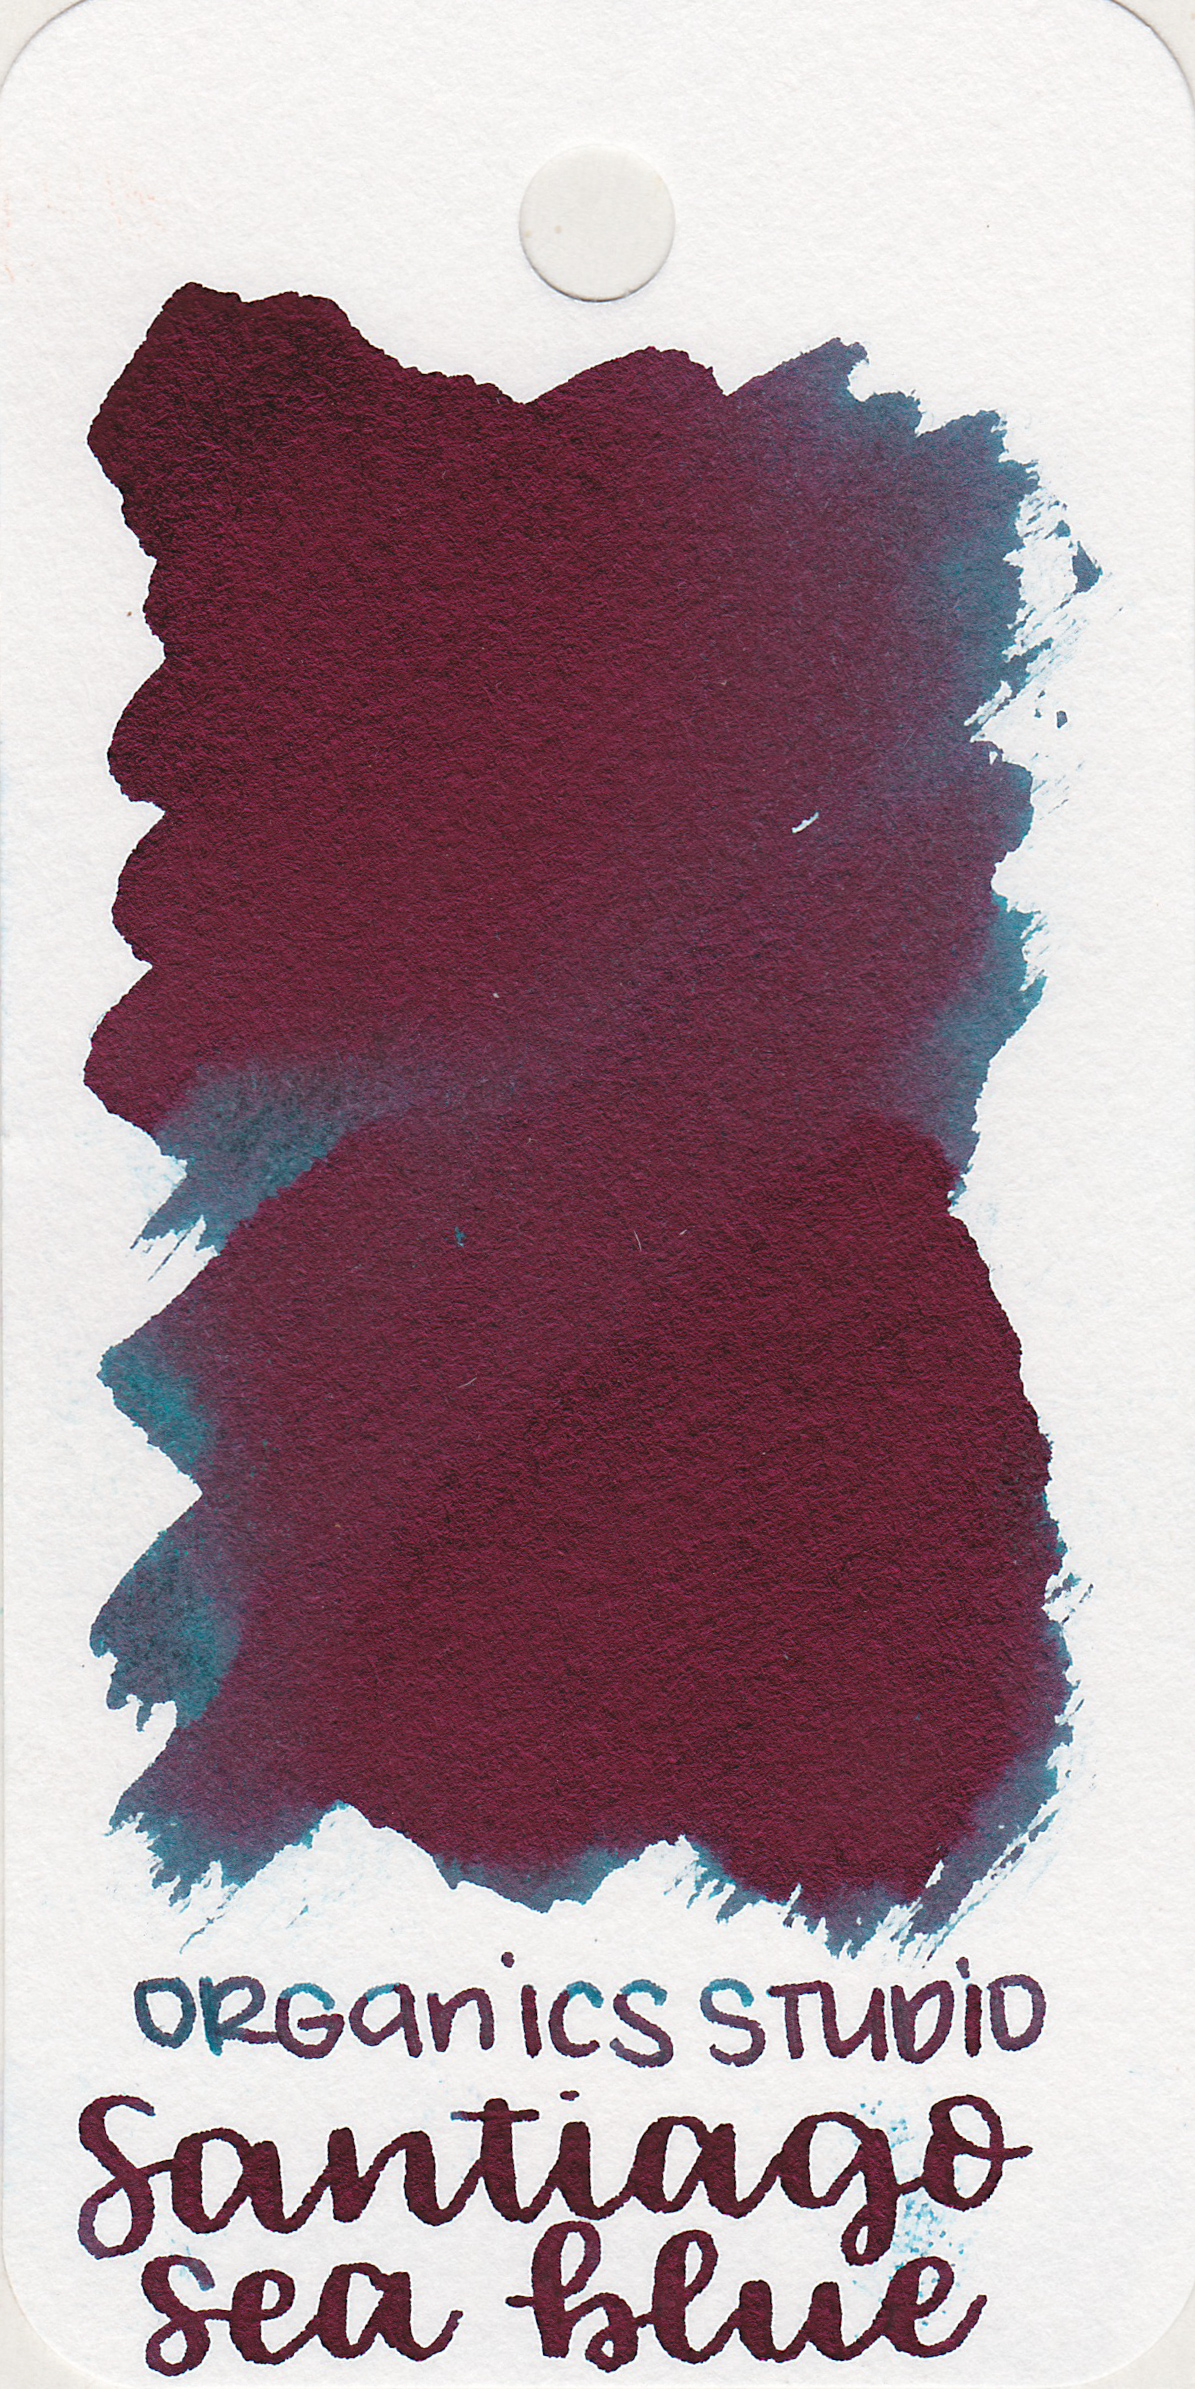 os-santiago-sea-blue-1.jpg